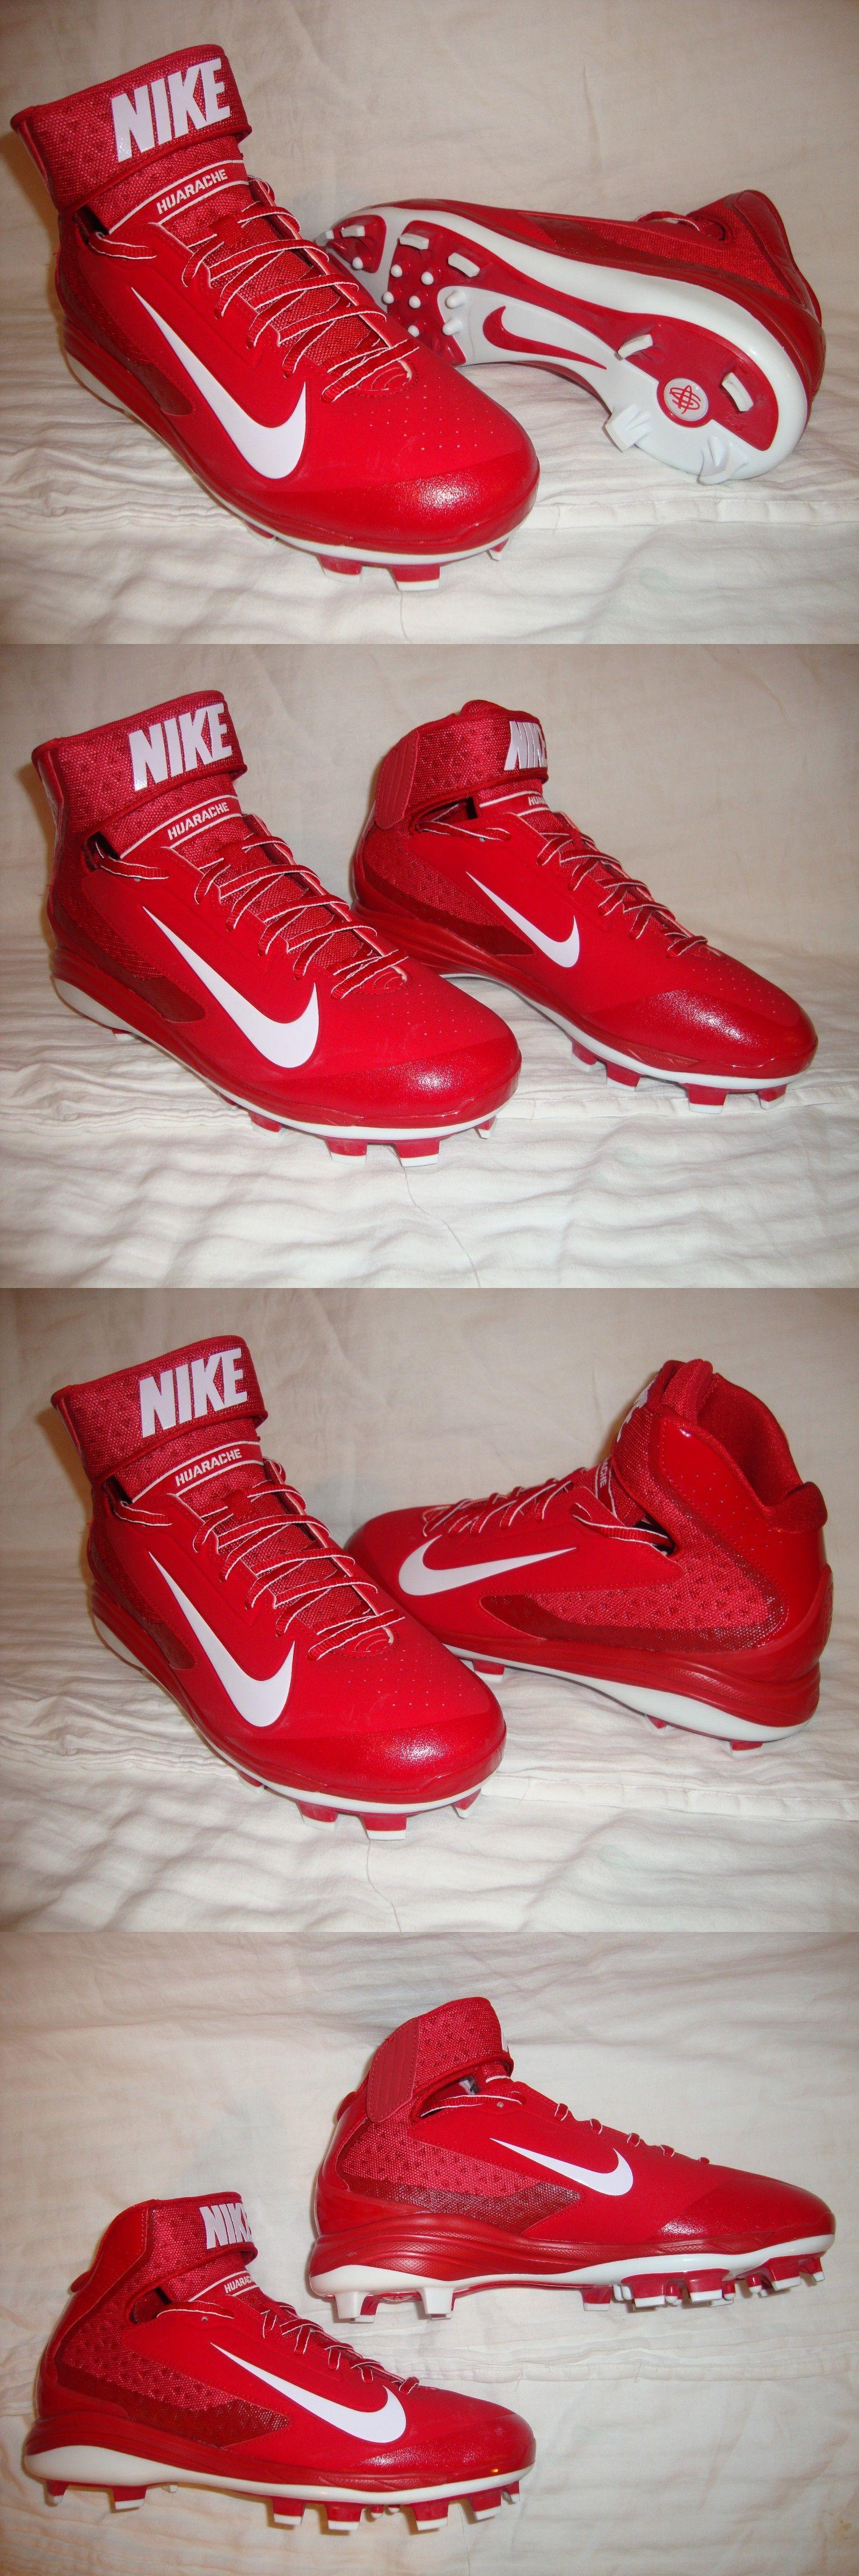 new air jordan shoes mens molded baseball sale